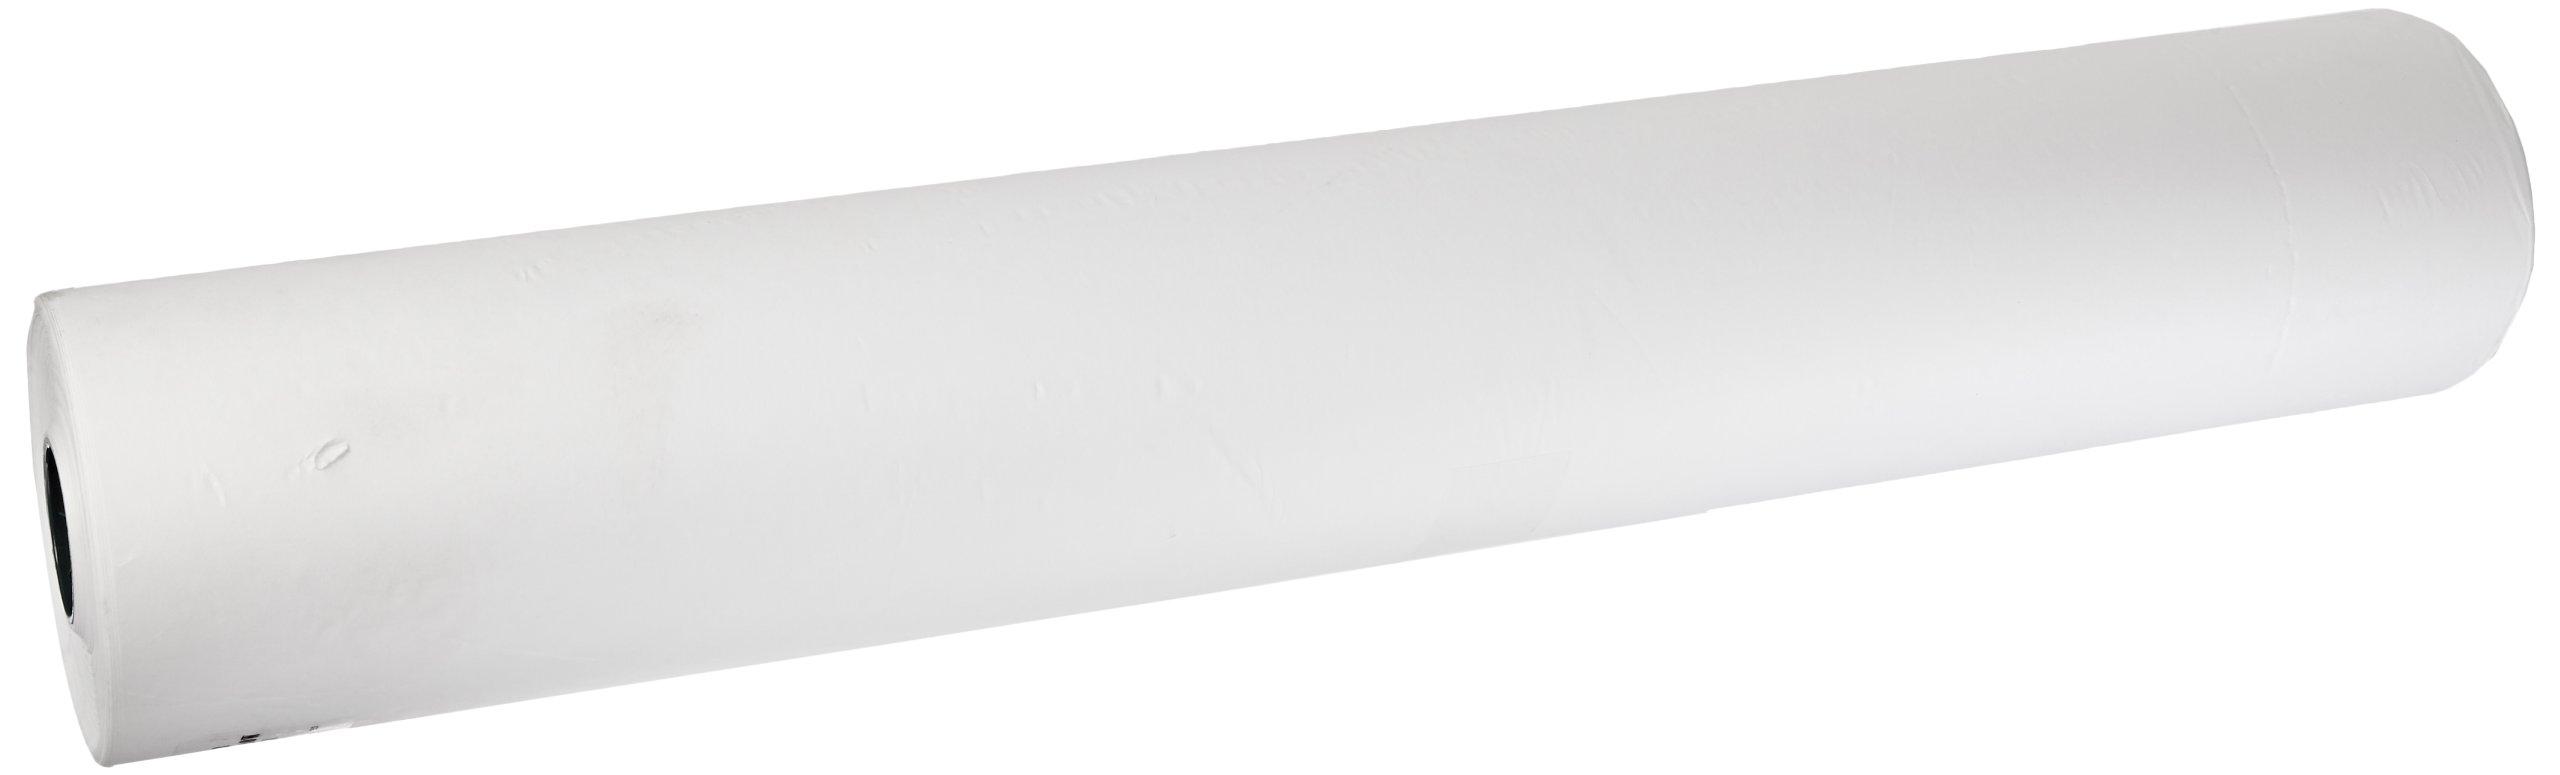 Aviditi Butcher Paper Roll, 1000' L x 48'' W, White (BP4840W)